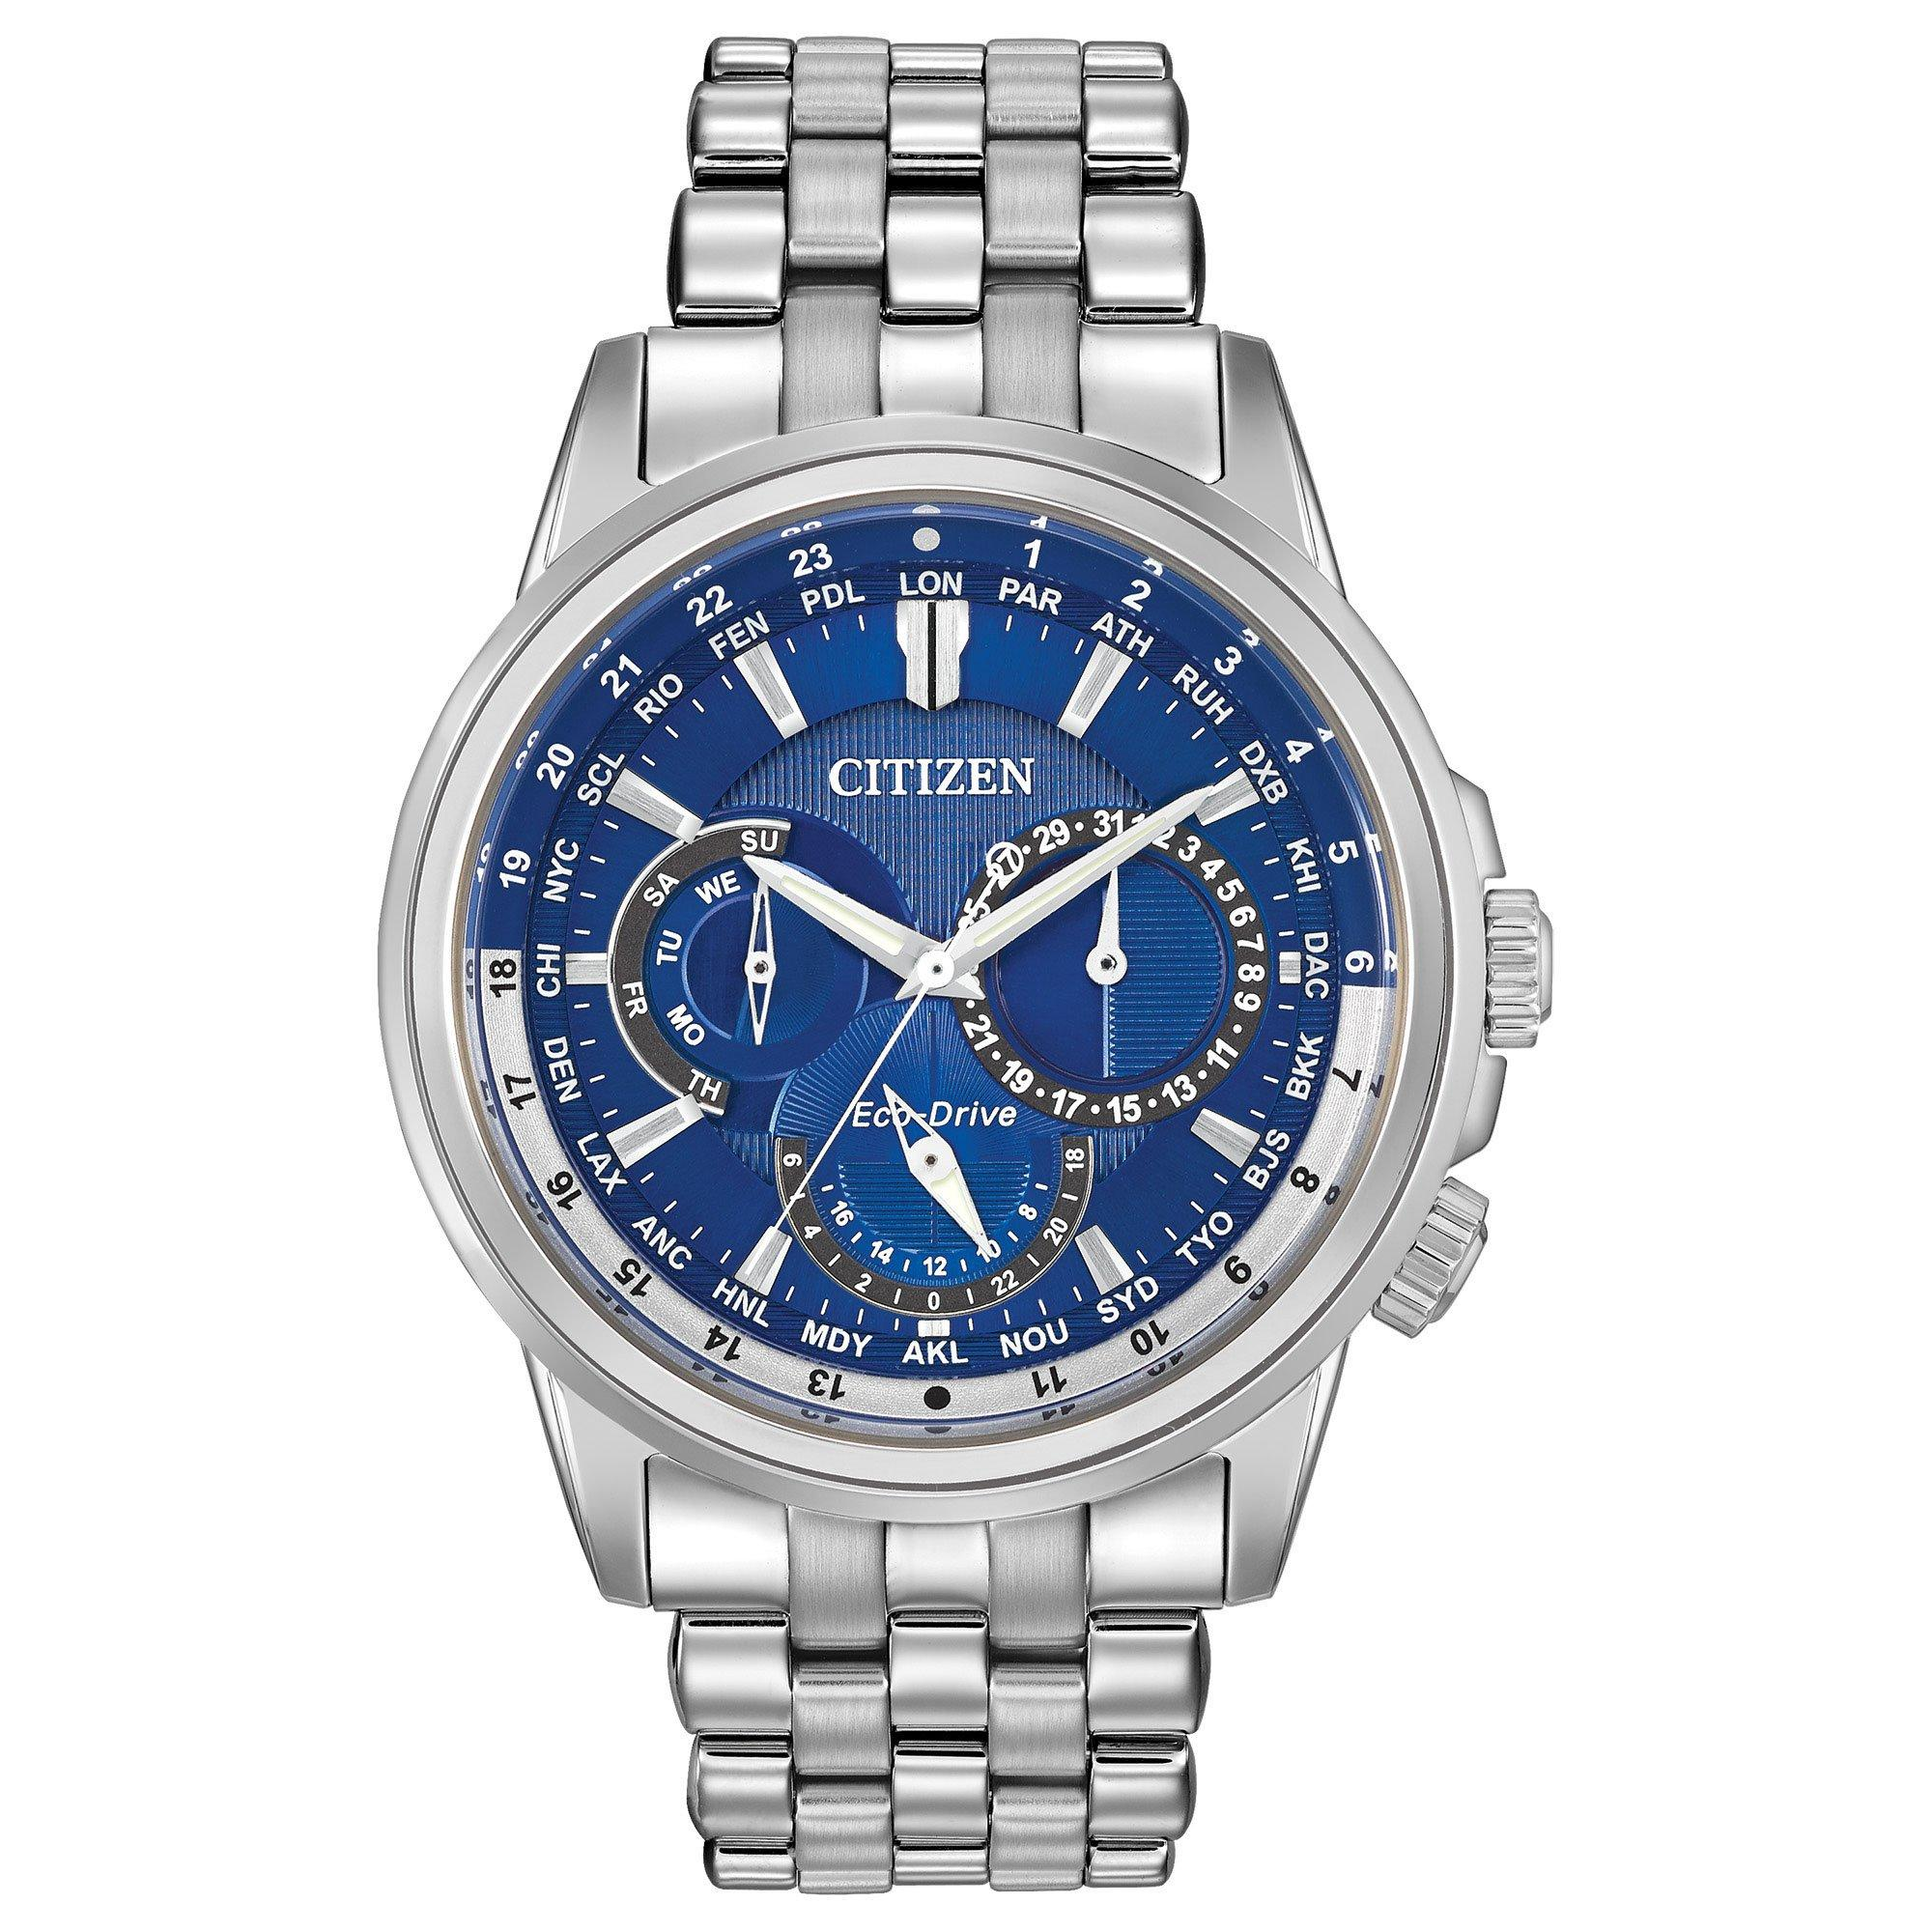 Citizen Calendrier Chronograph Men's Watch